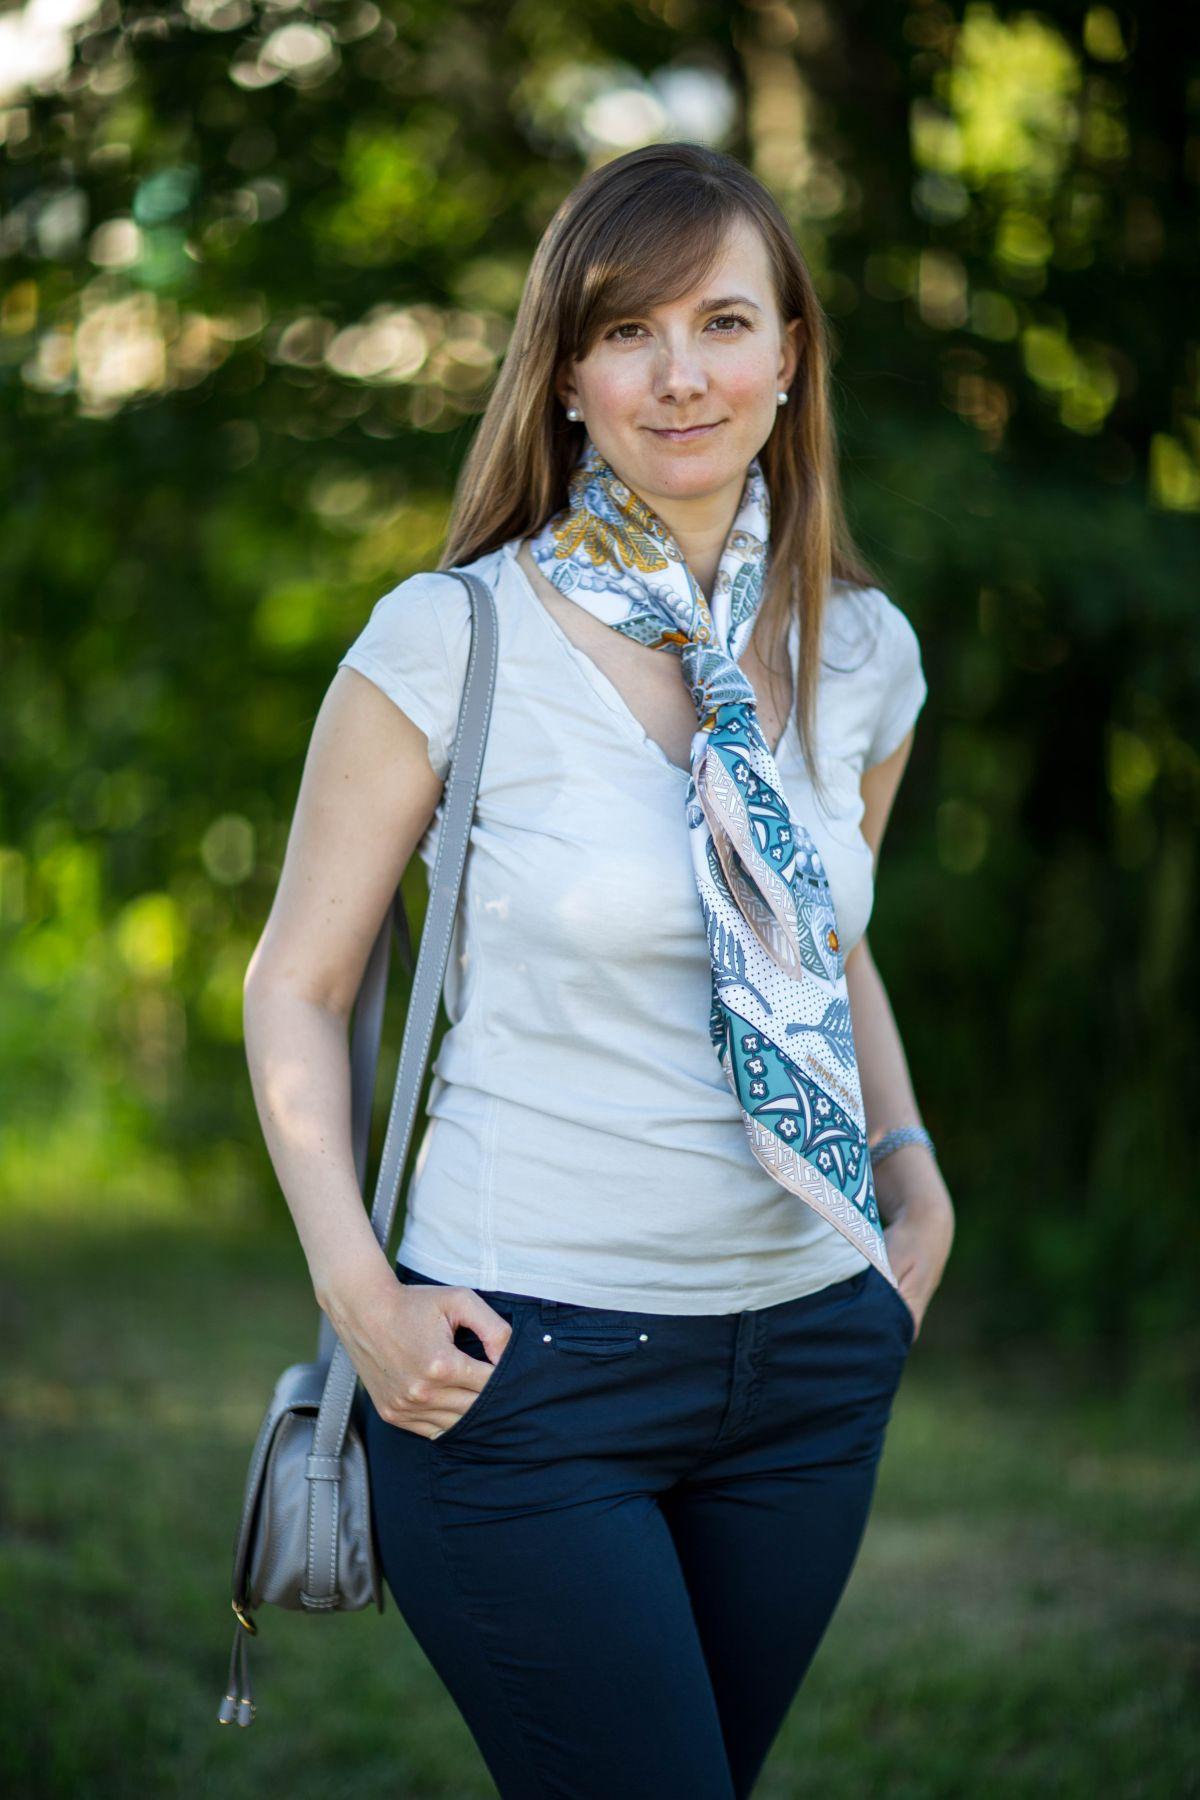 Hermes scarf, Zénobie, Reine de Palmyre, knot, knotting, tutorial, hermes carre, Hermes Schal, эрмес, платок, карре, как красиво завязать платок, how to wear a scarf